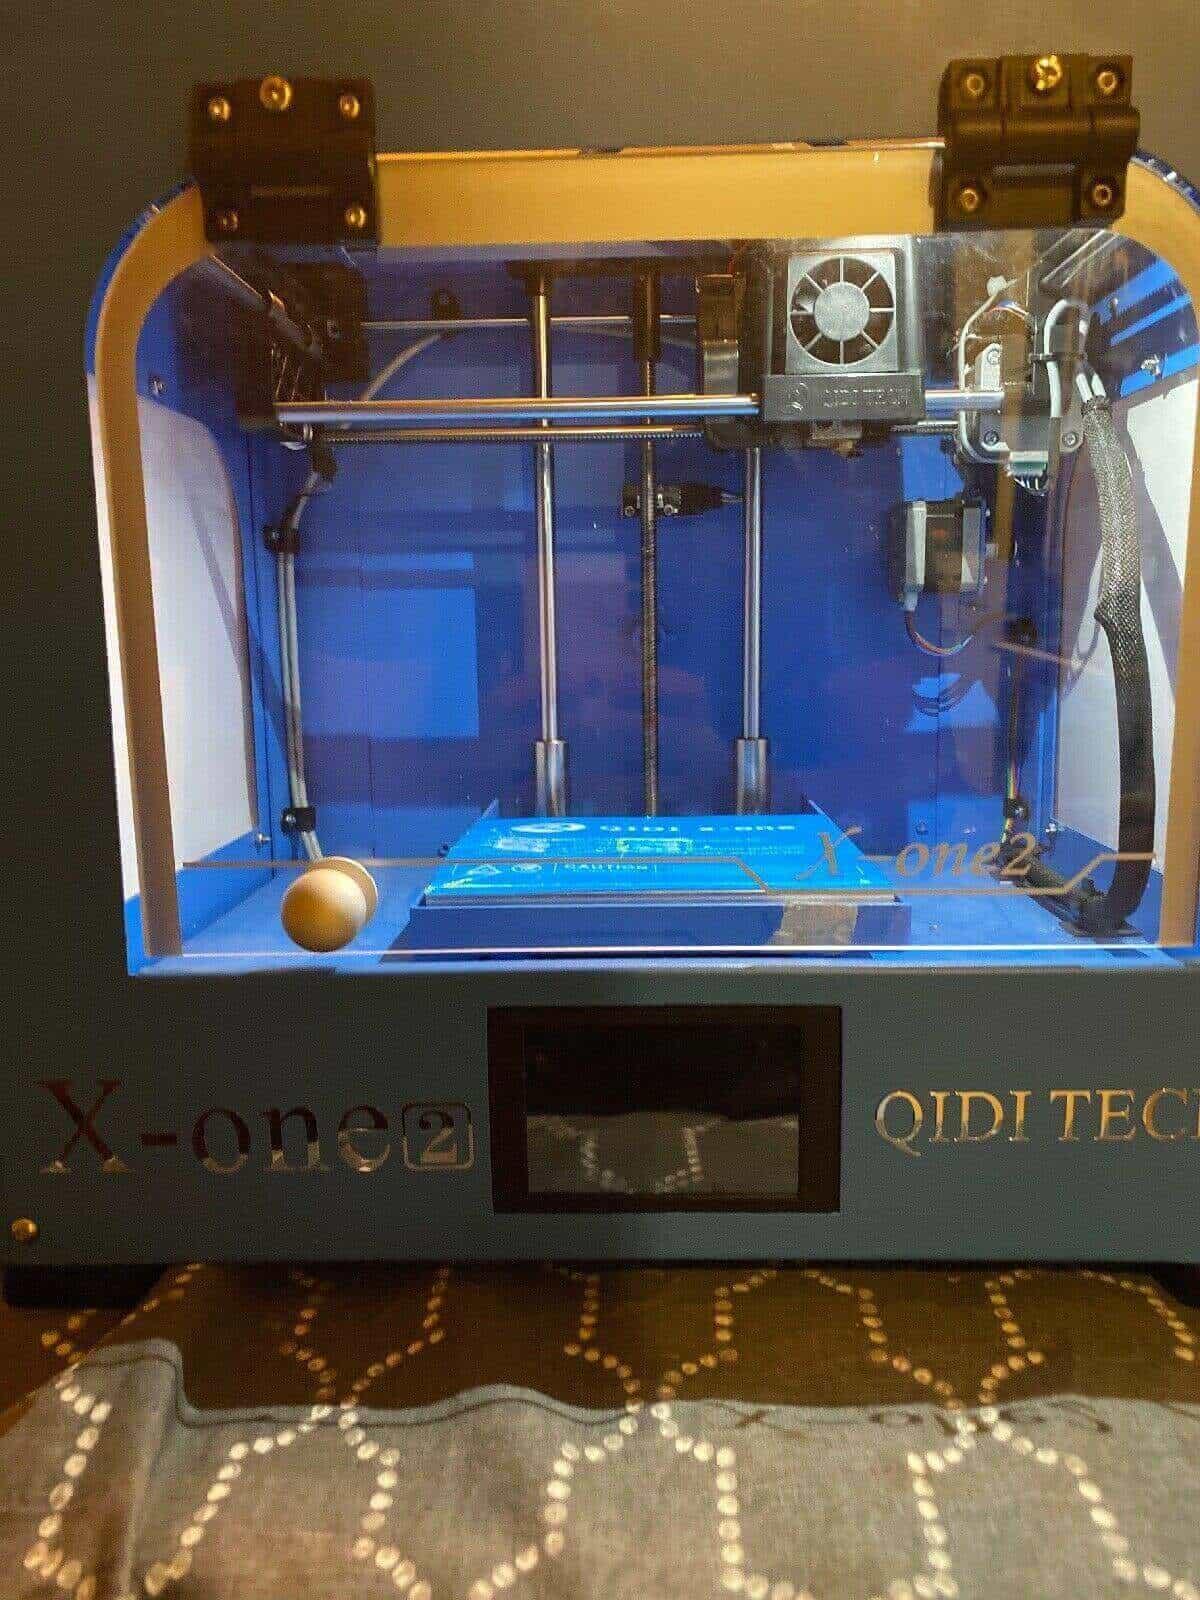 QIDI Technology X-One2 3D Printer